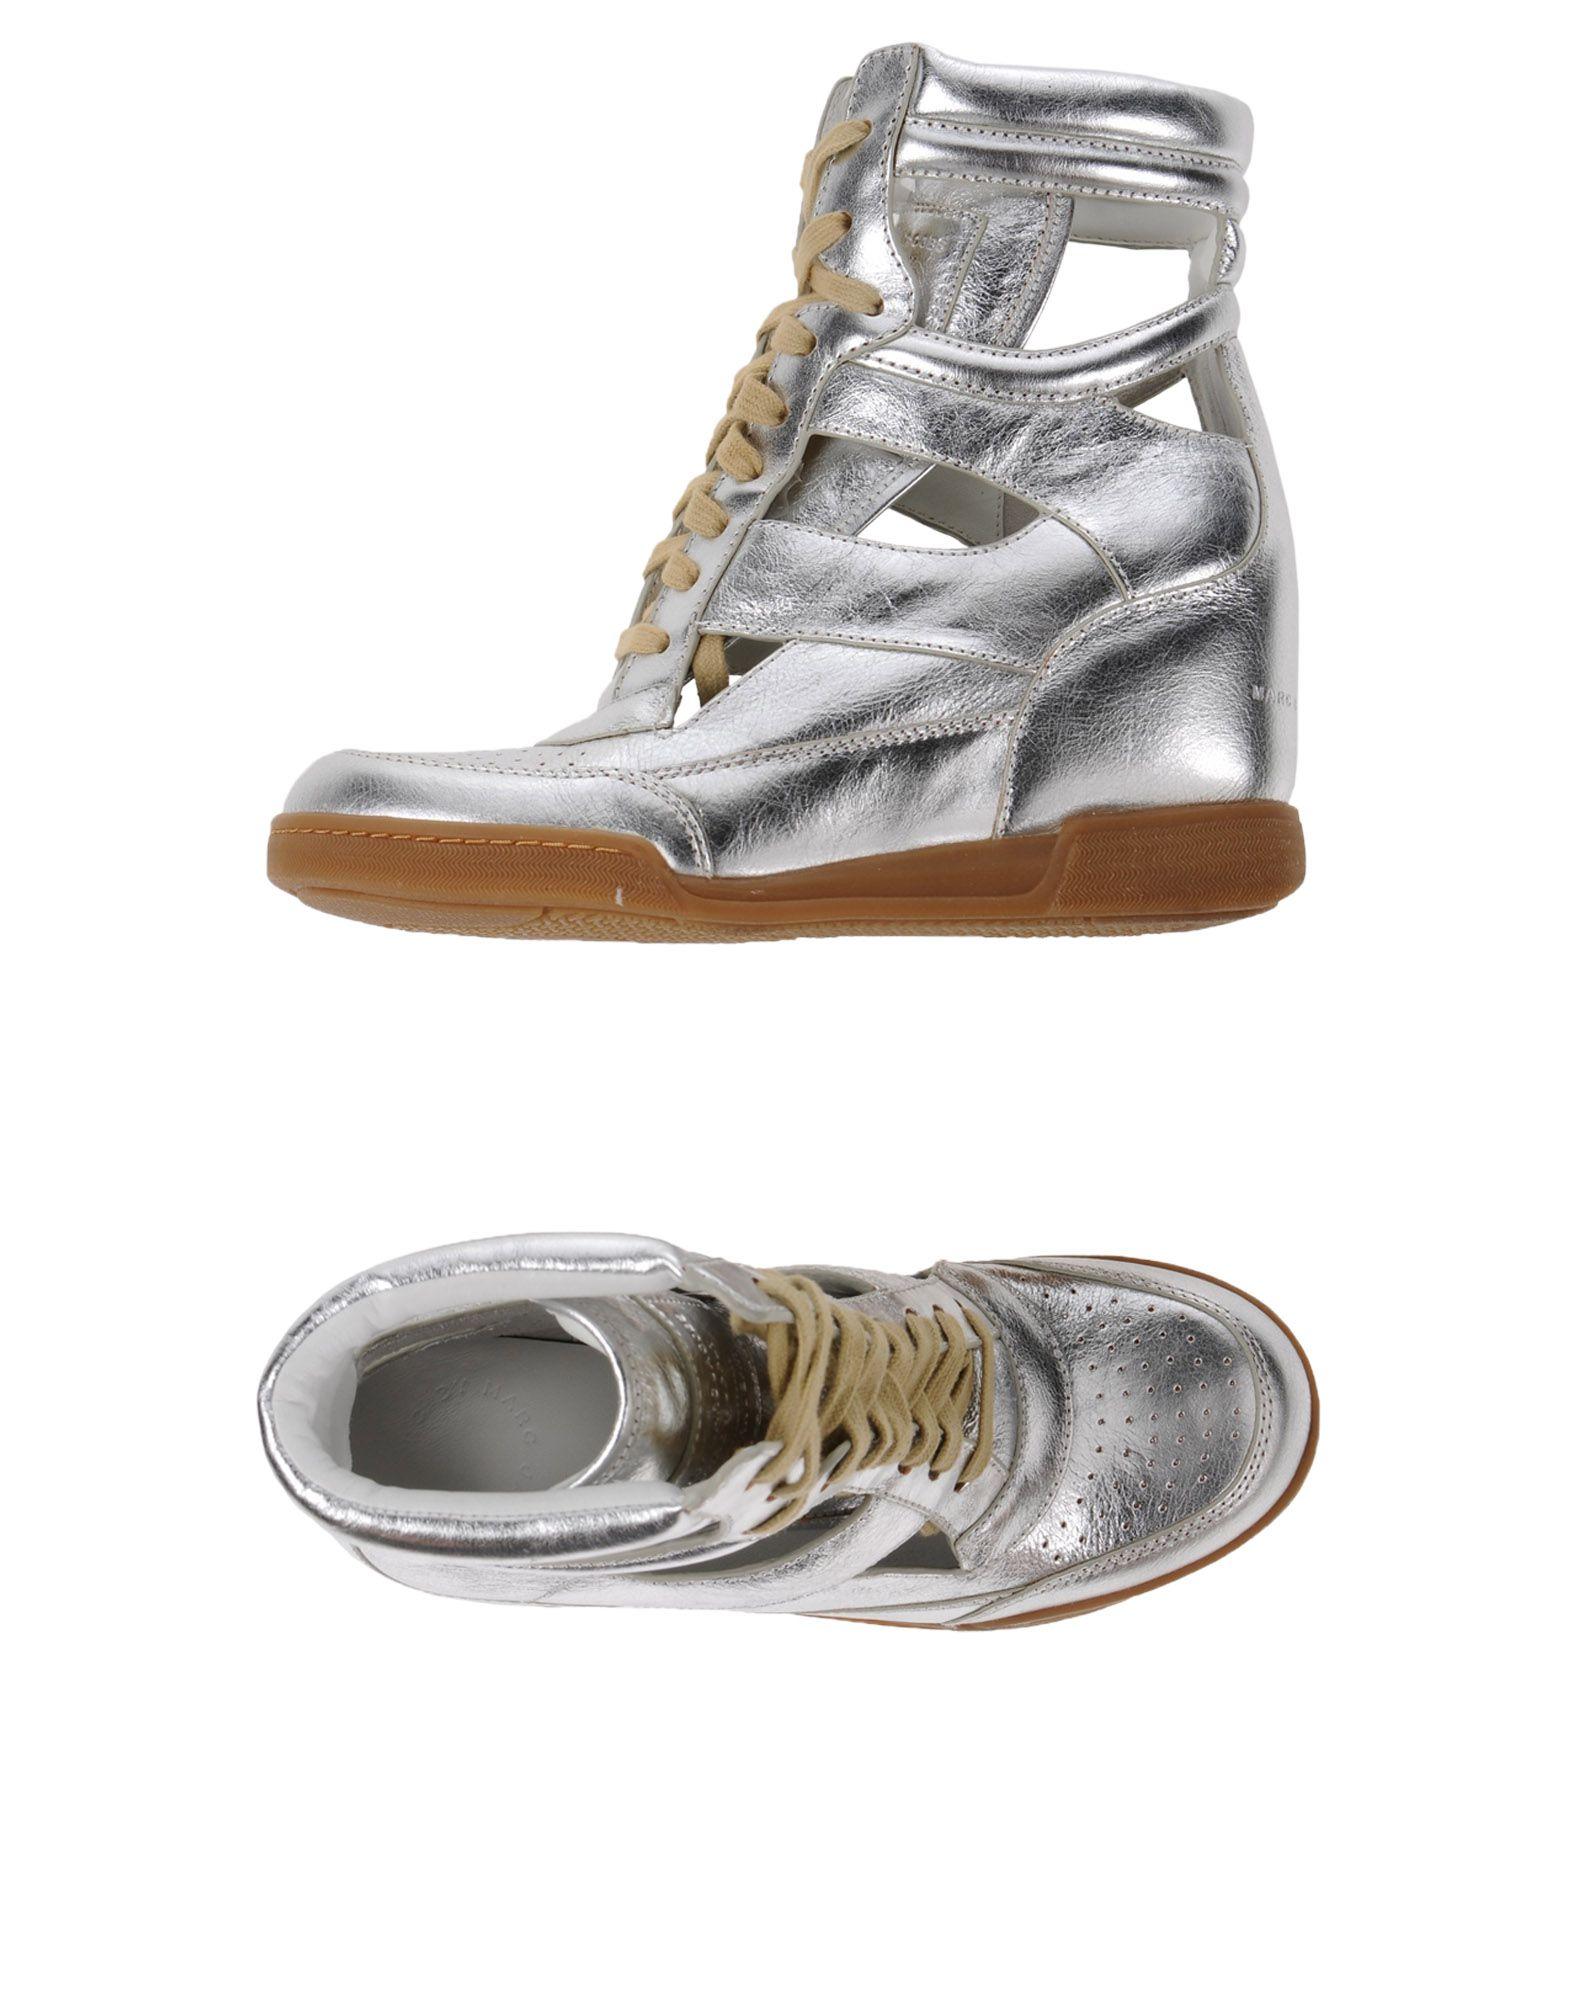 Marc By Marc Jacobs Sneakers Damen  11195272MHGut aussehende strapazierfähige Schuhe